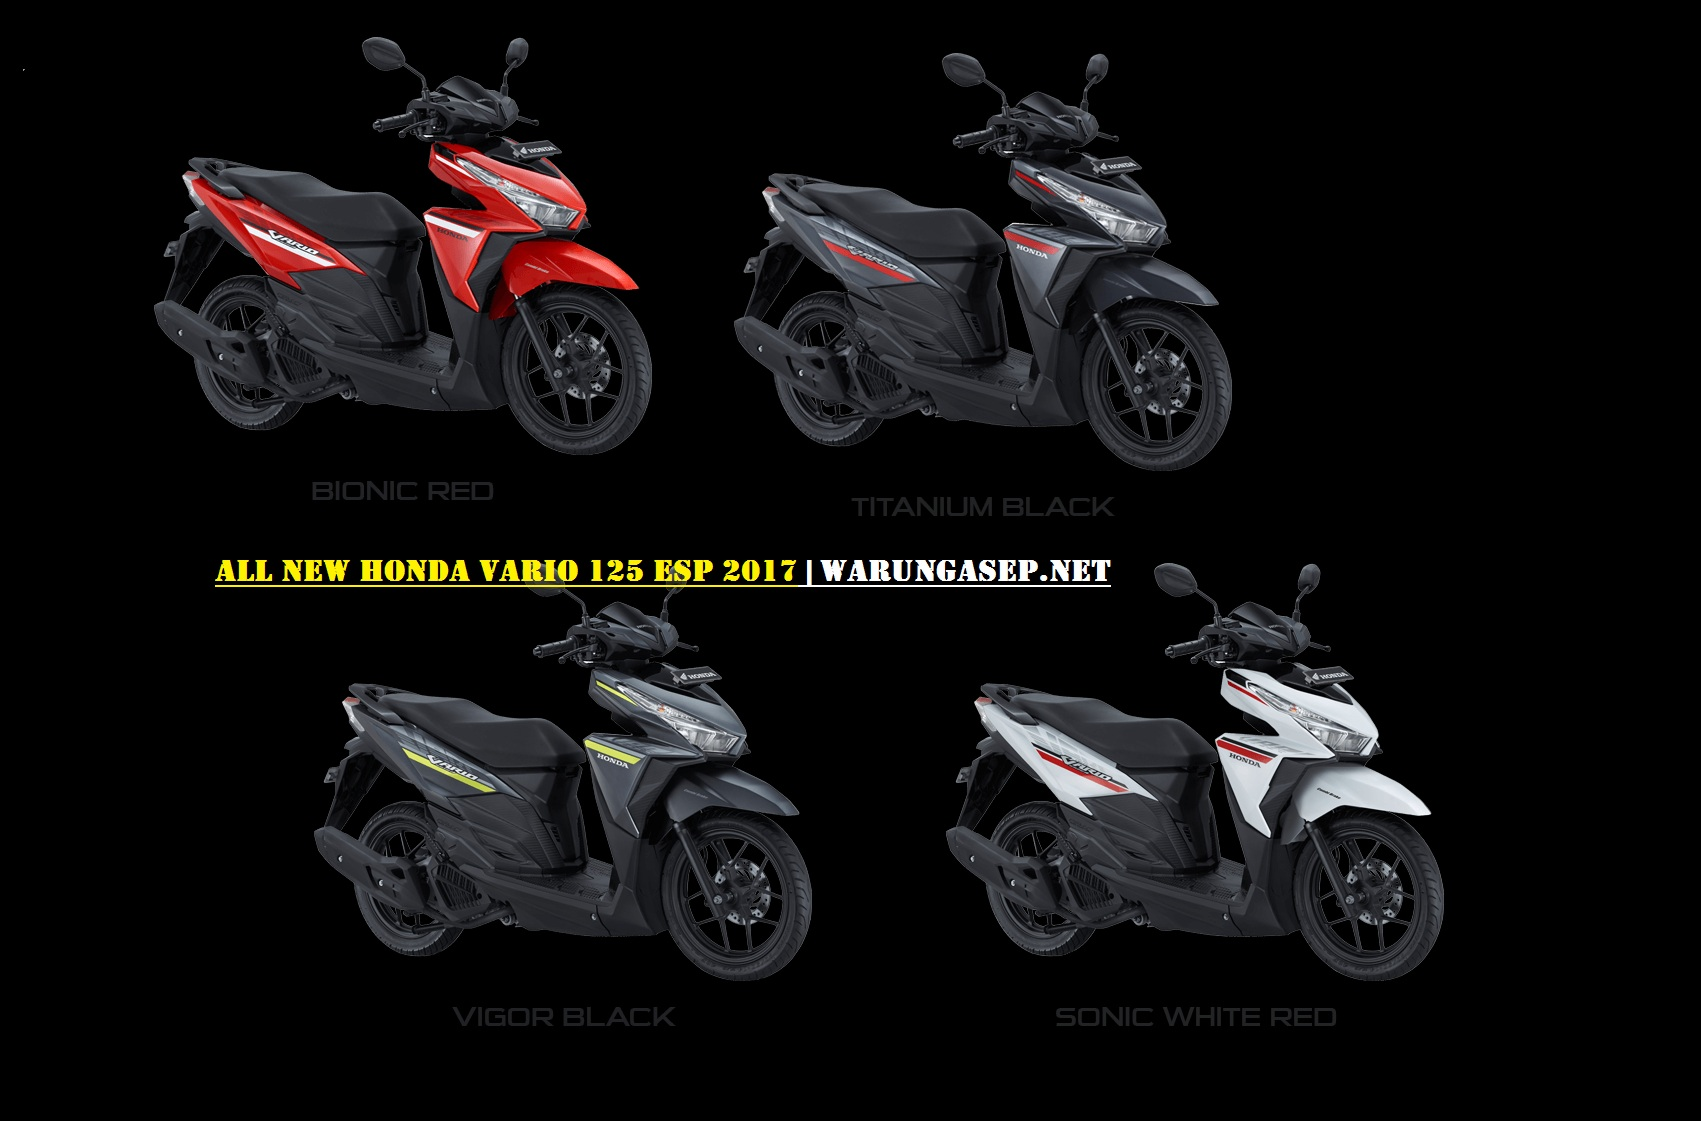 harga all new vellfire 2017 brand toyota altis price honda vario 125 terbaru warungasep